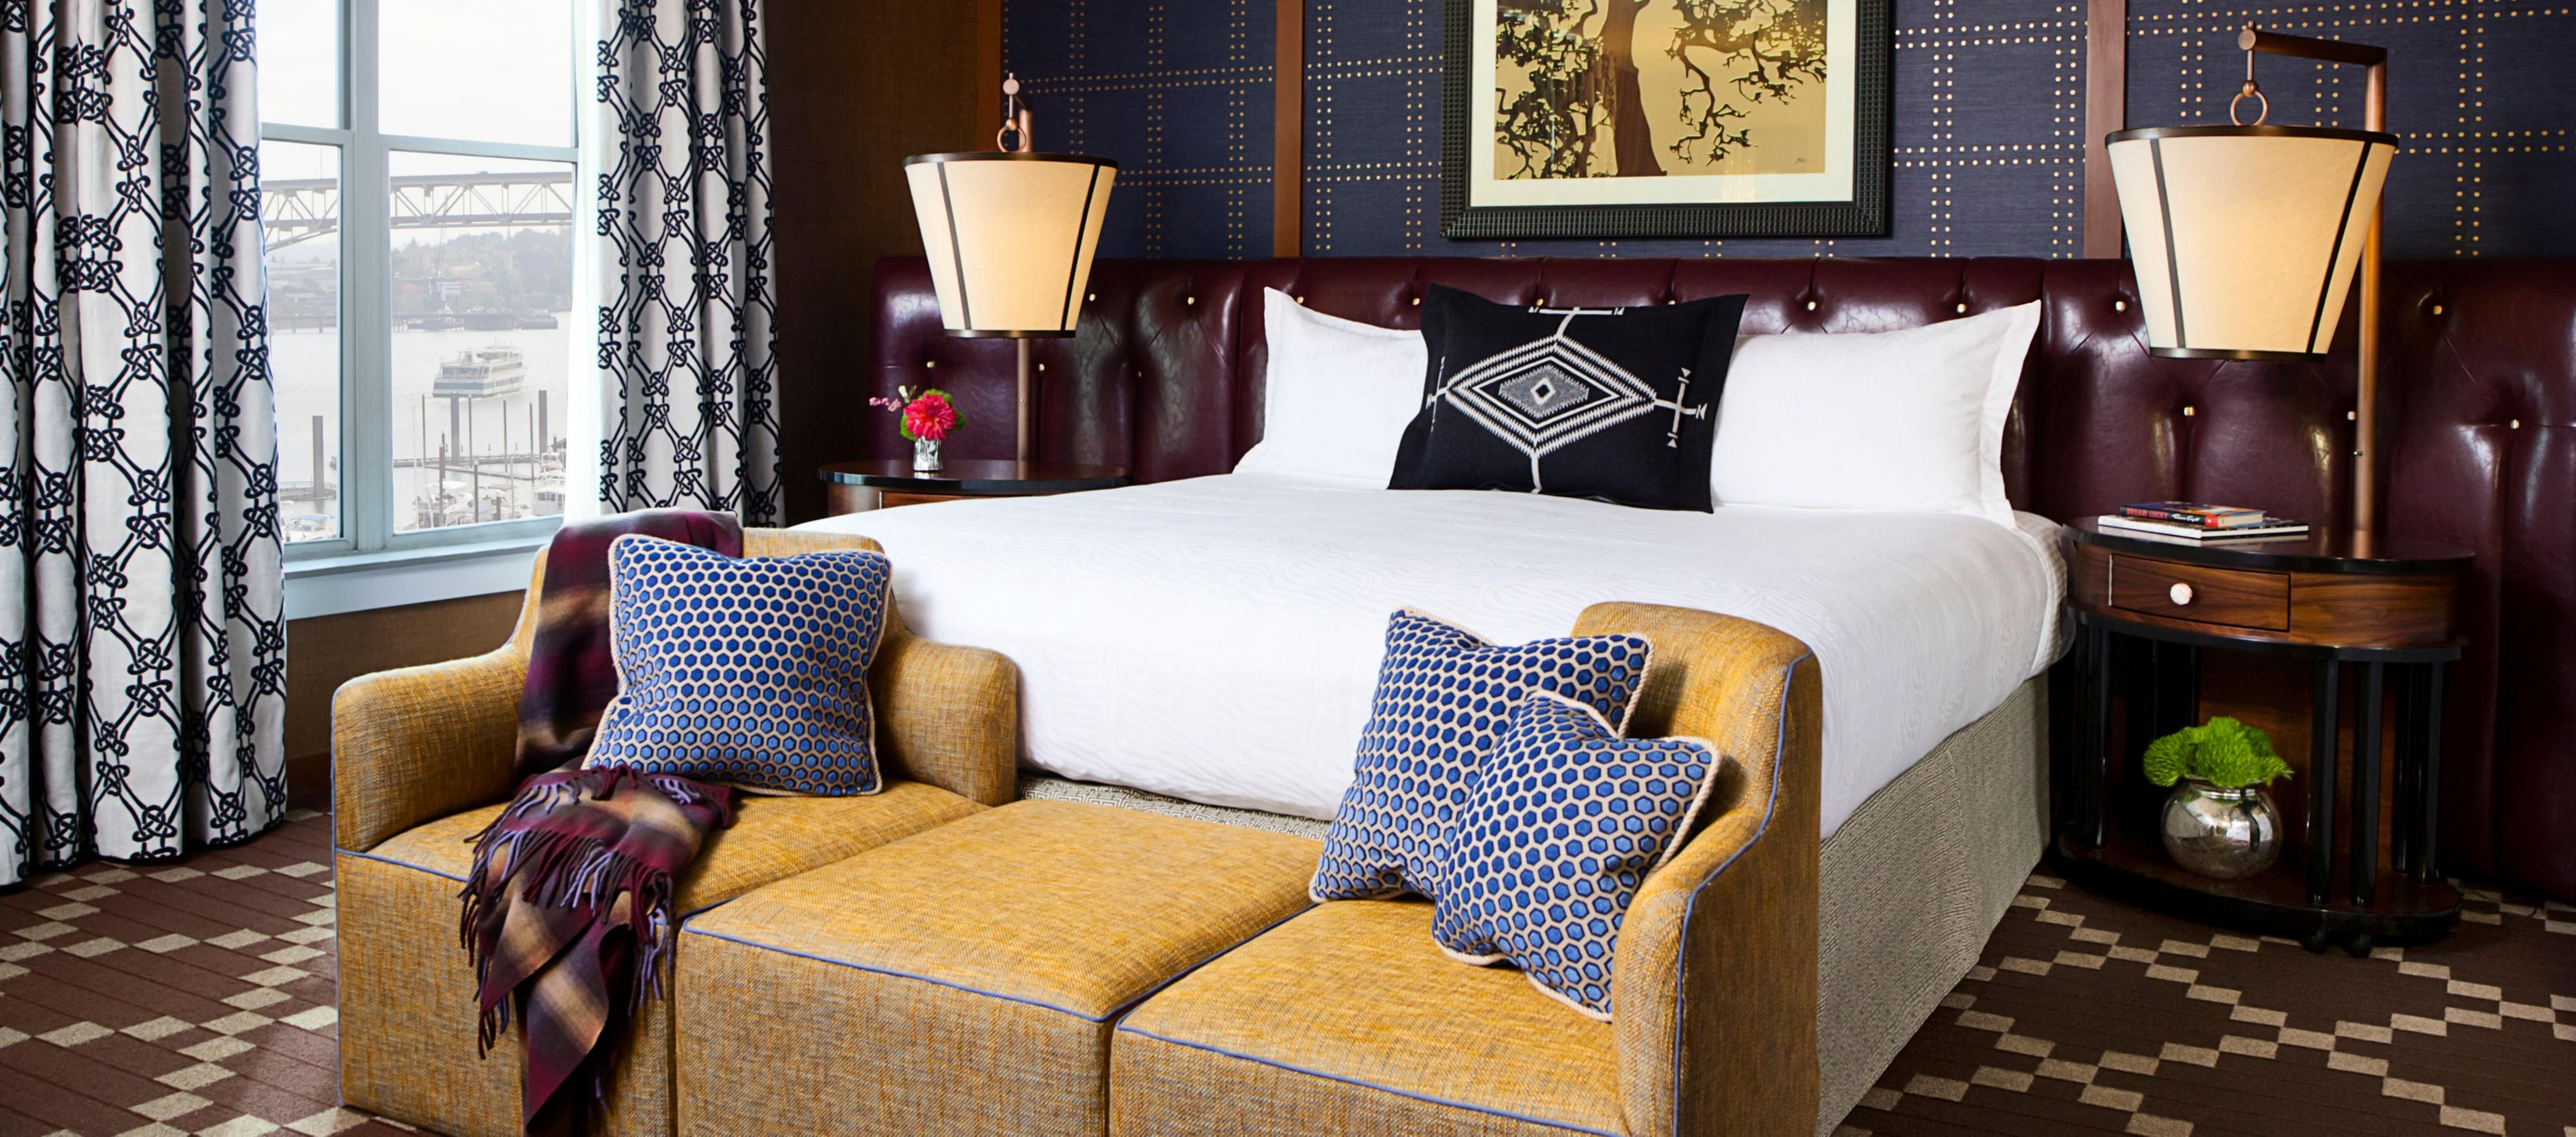 Kimpton Portland 4648212819 34x15 Riverplace Hotel